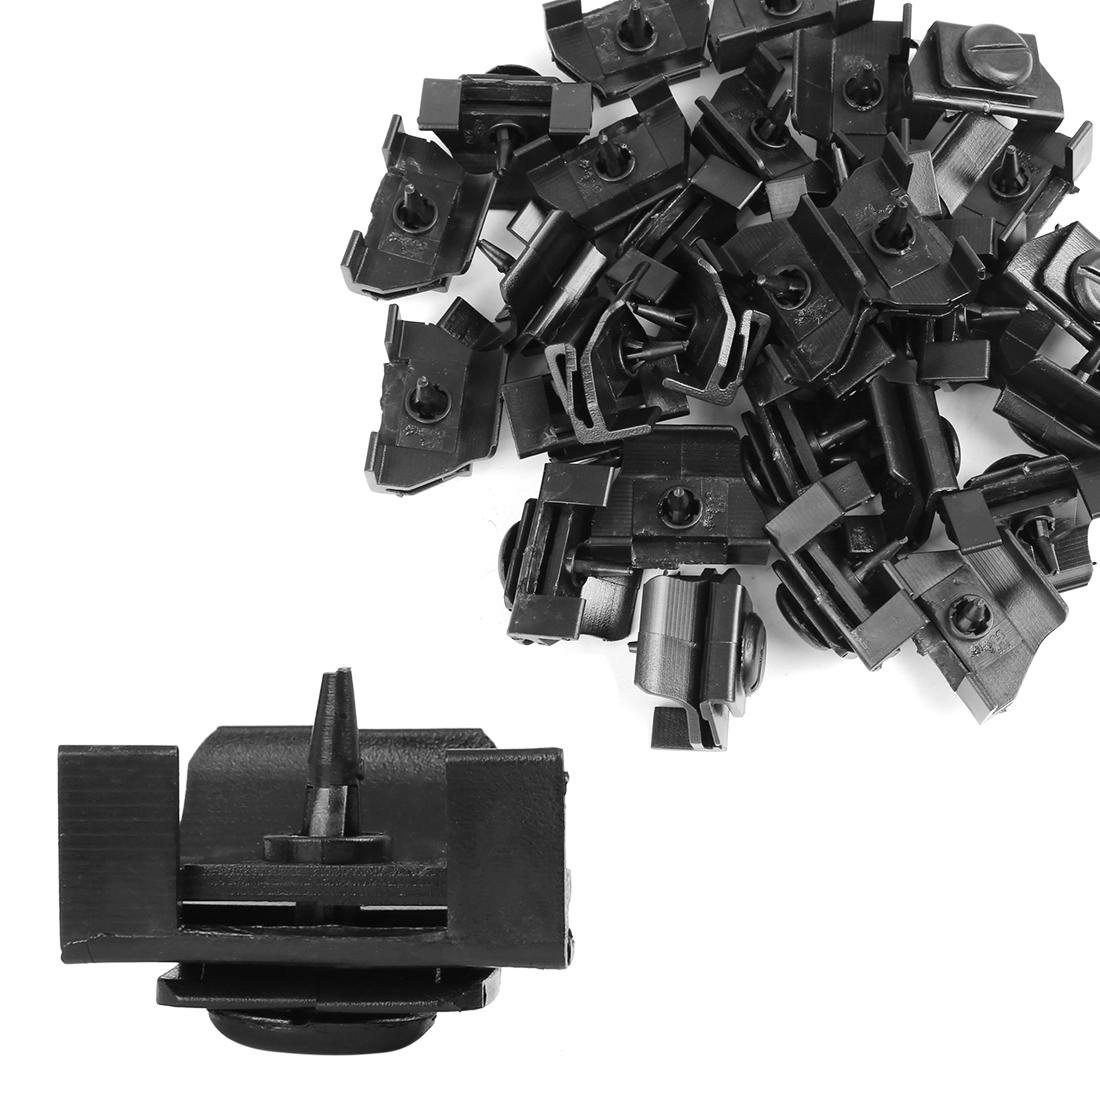 30pcs Fender Liner Retainer Clips for Toyota RAV4 Tacoma Scion iQ xD 5387928010